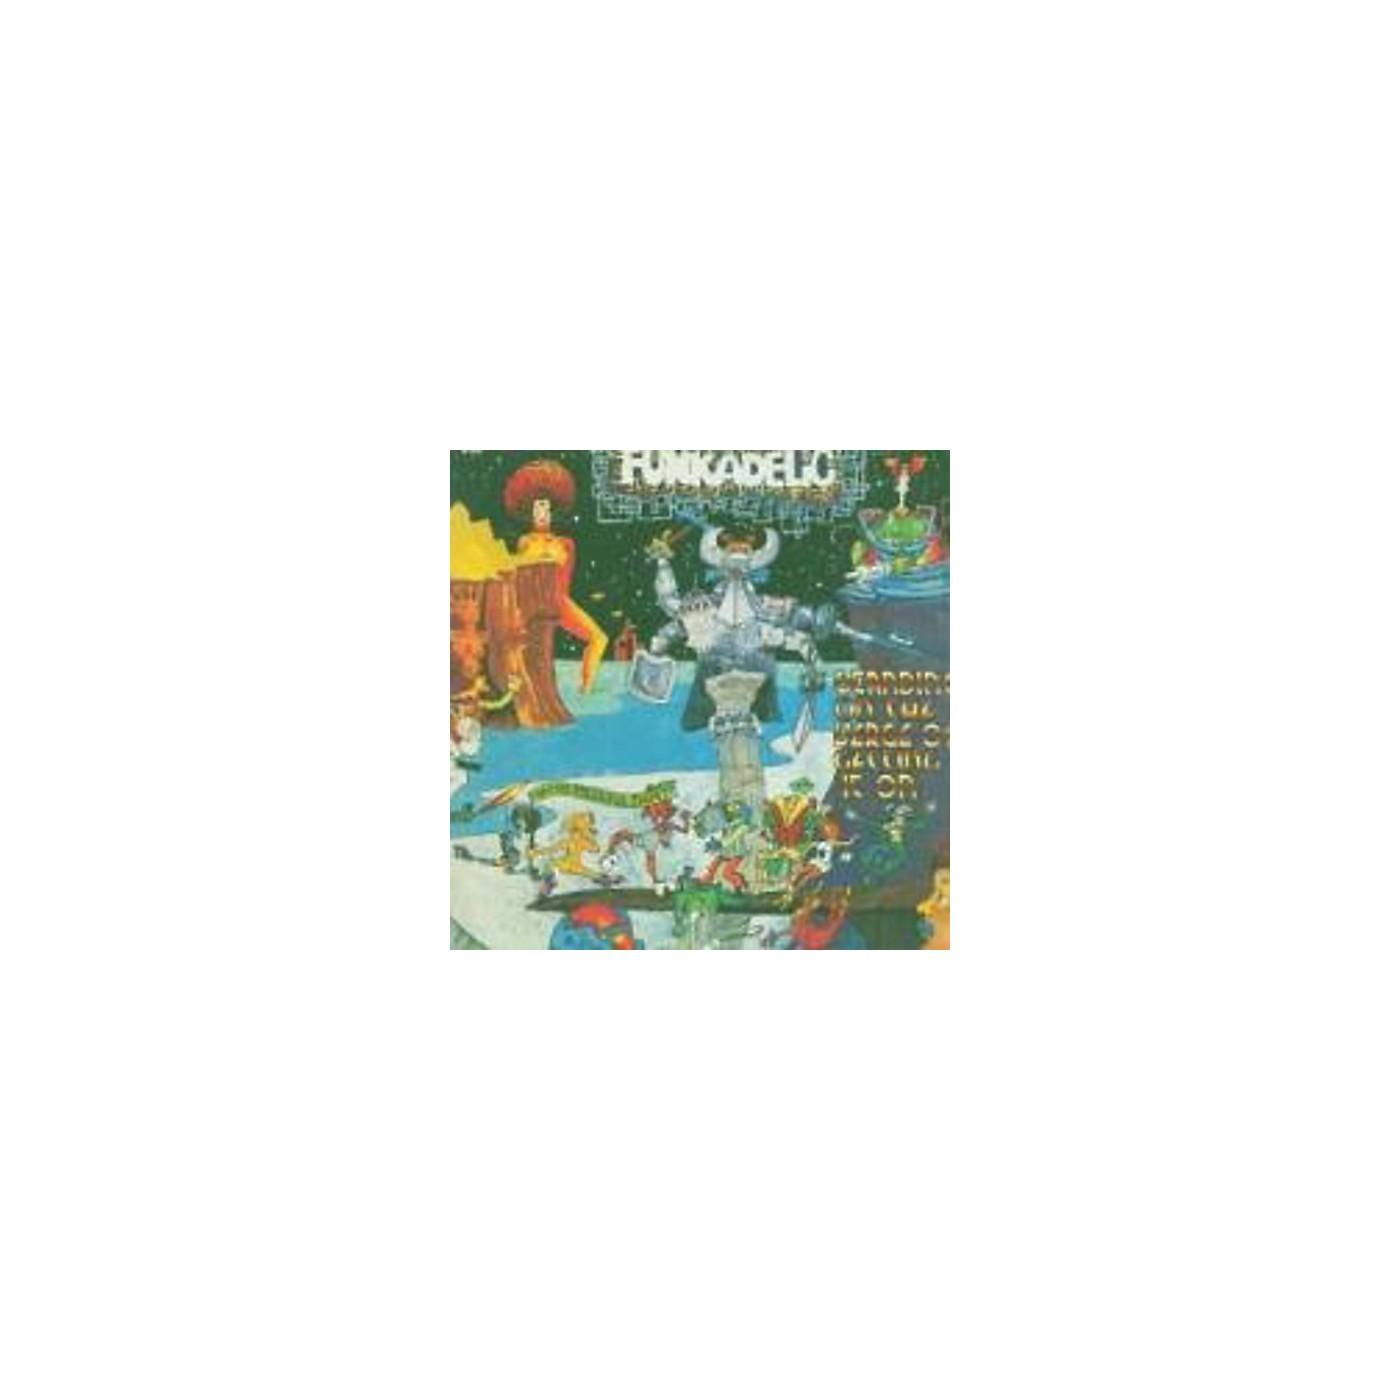 Alliance Funkadelic - Standing on Verge of Getting It on thumbnail